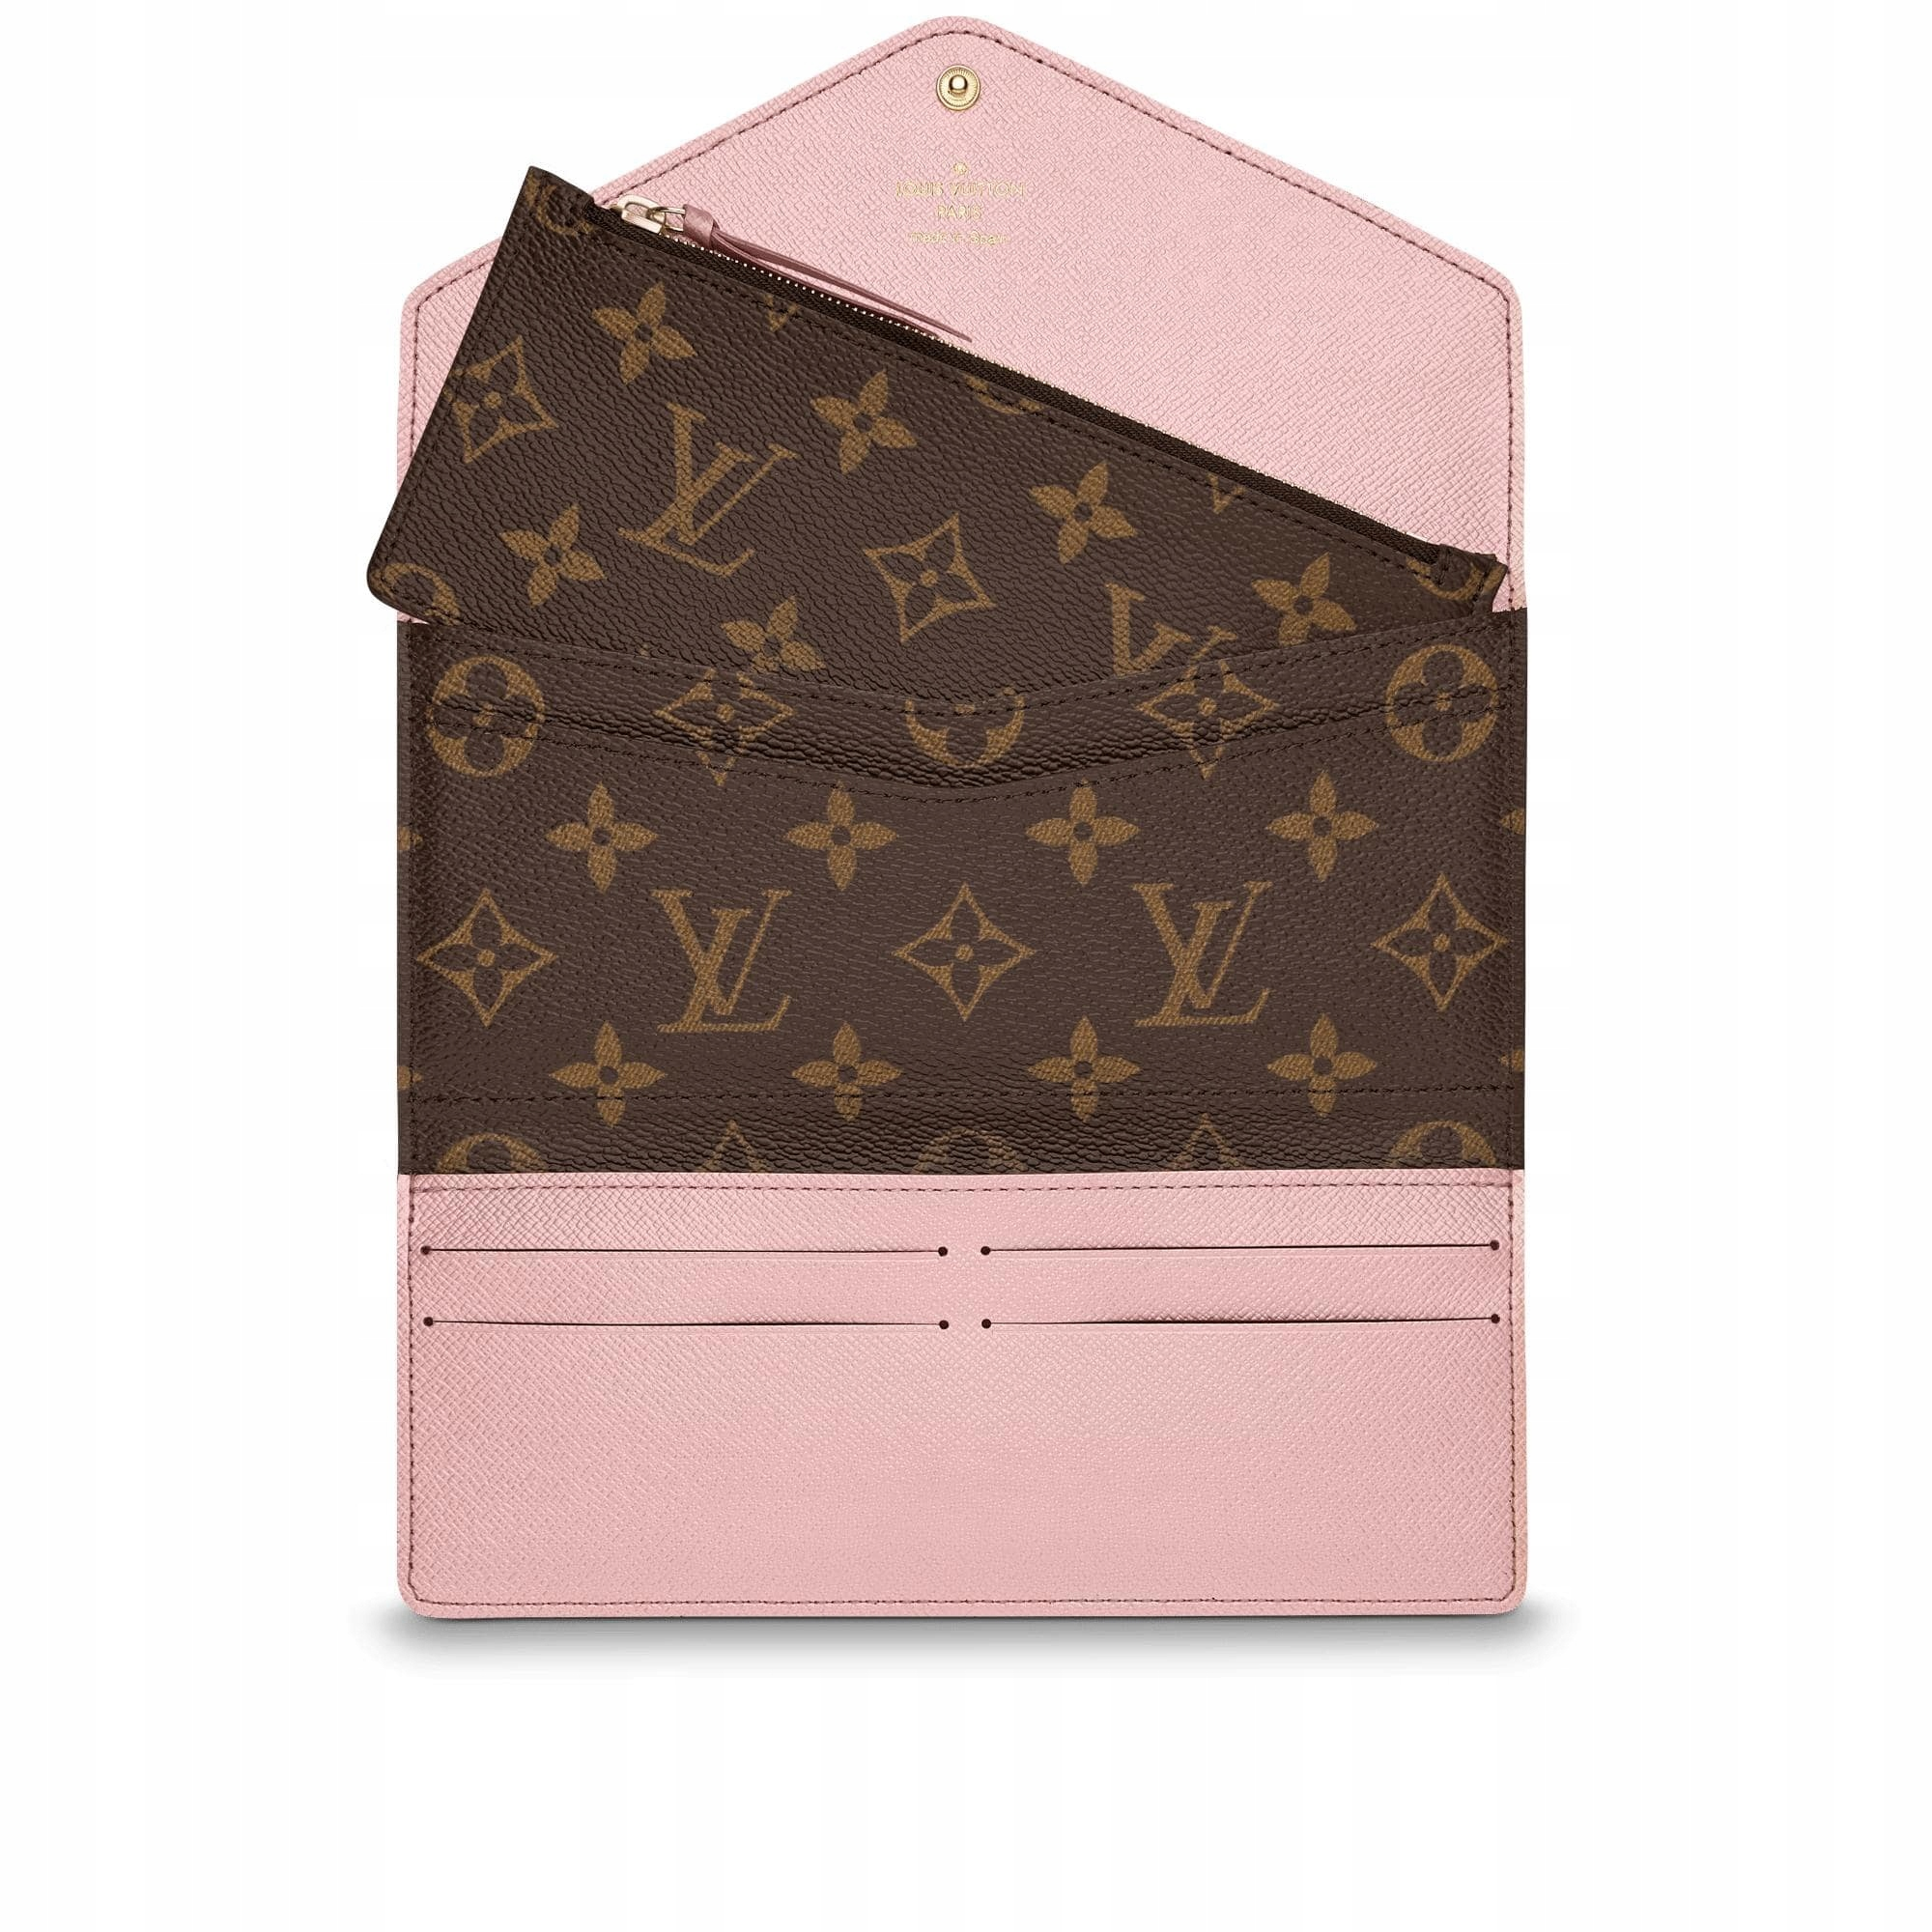 b7f83b2045738 Portfel Josephine Louis Vuitton oryginalny - 7633981141 - oficjalne ...